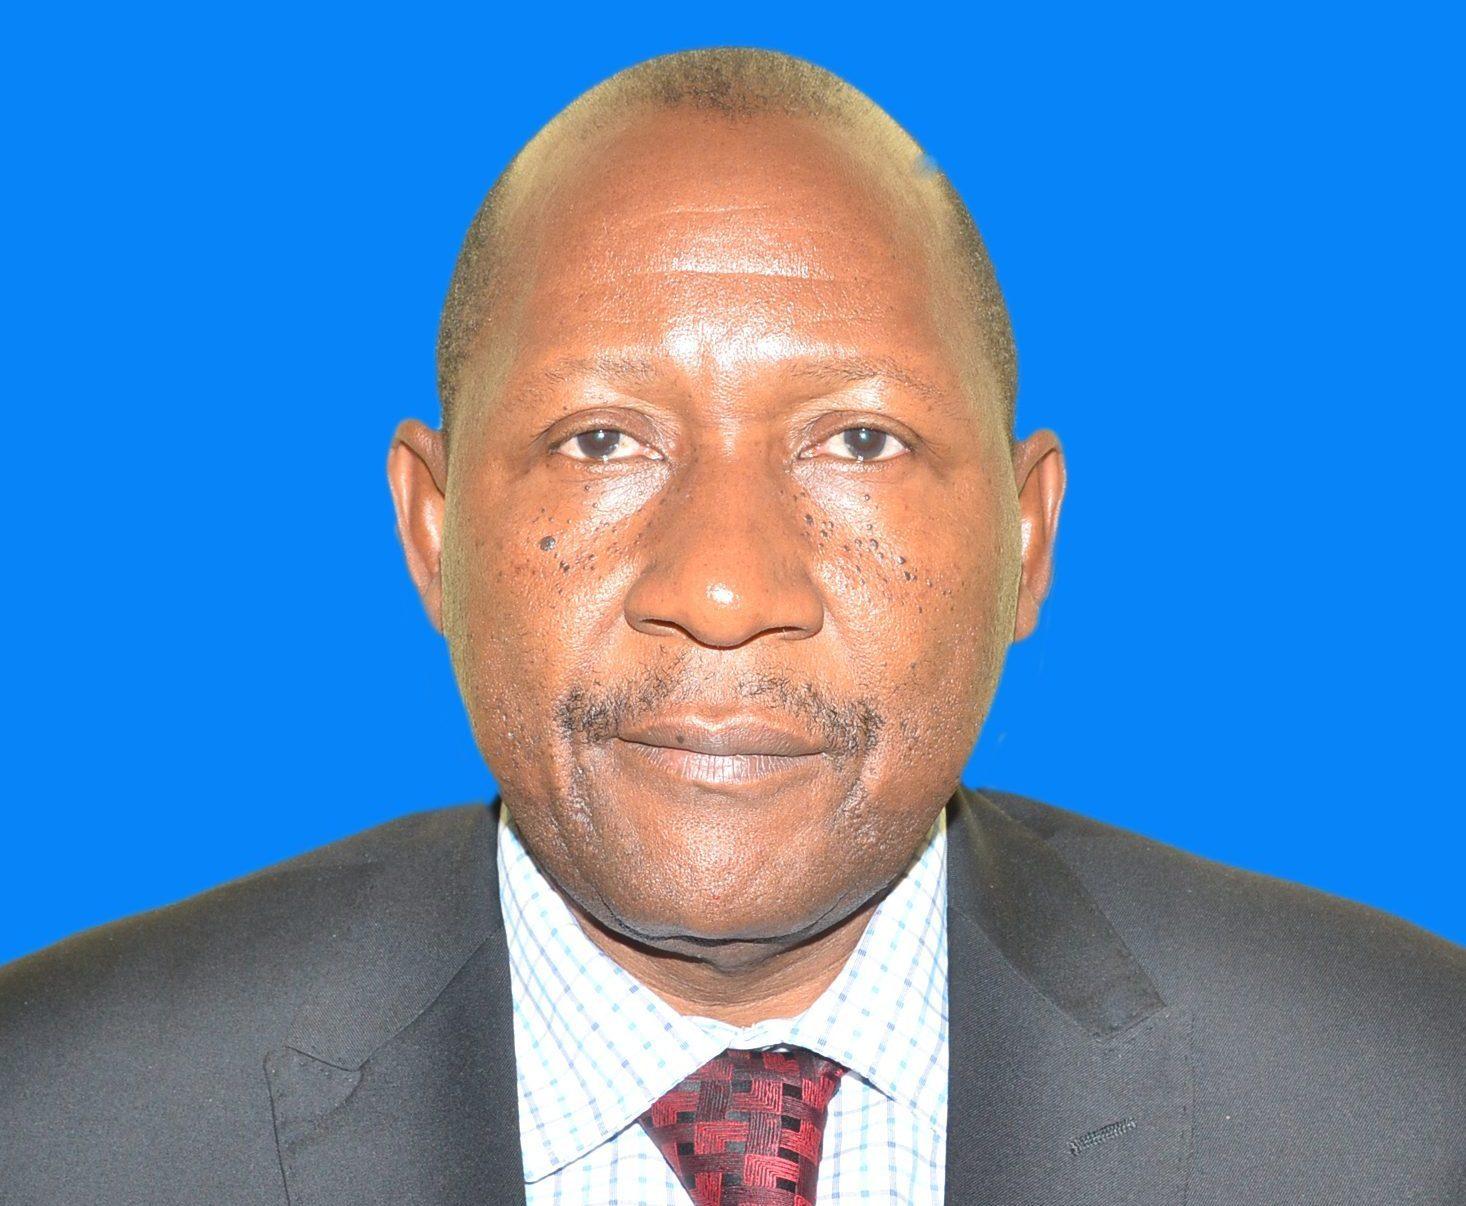 Mohammed Nyasama